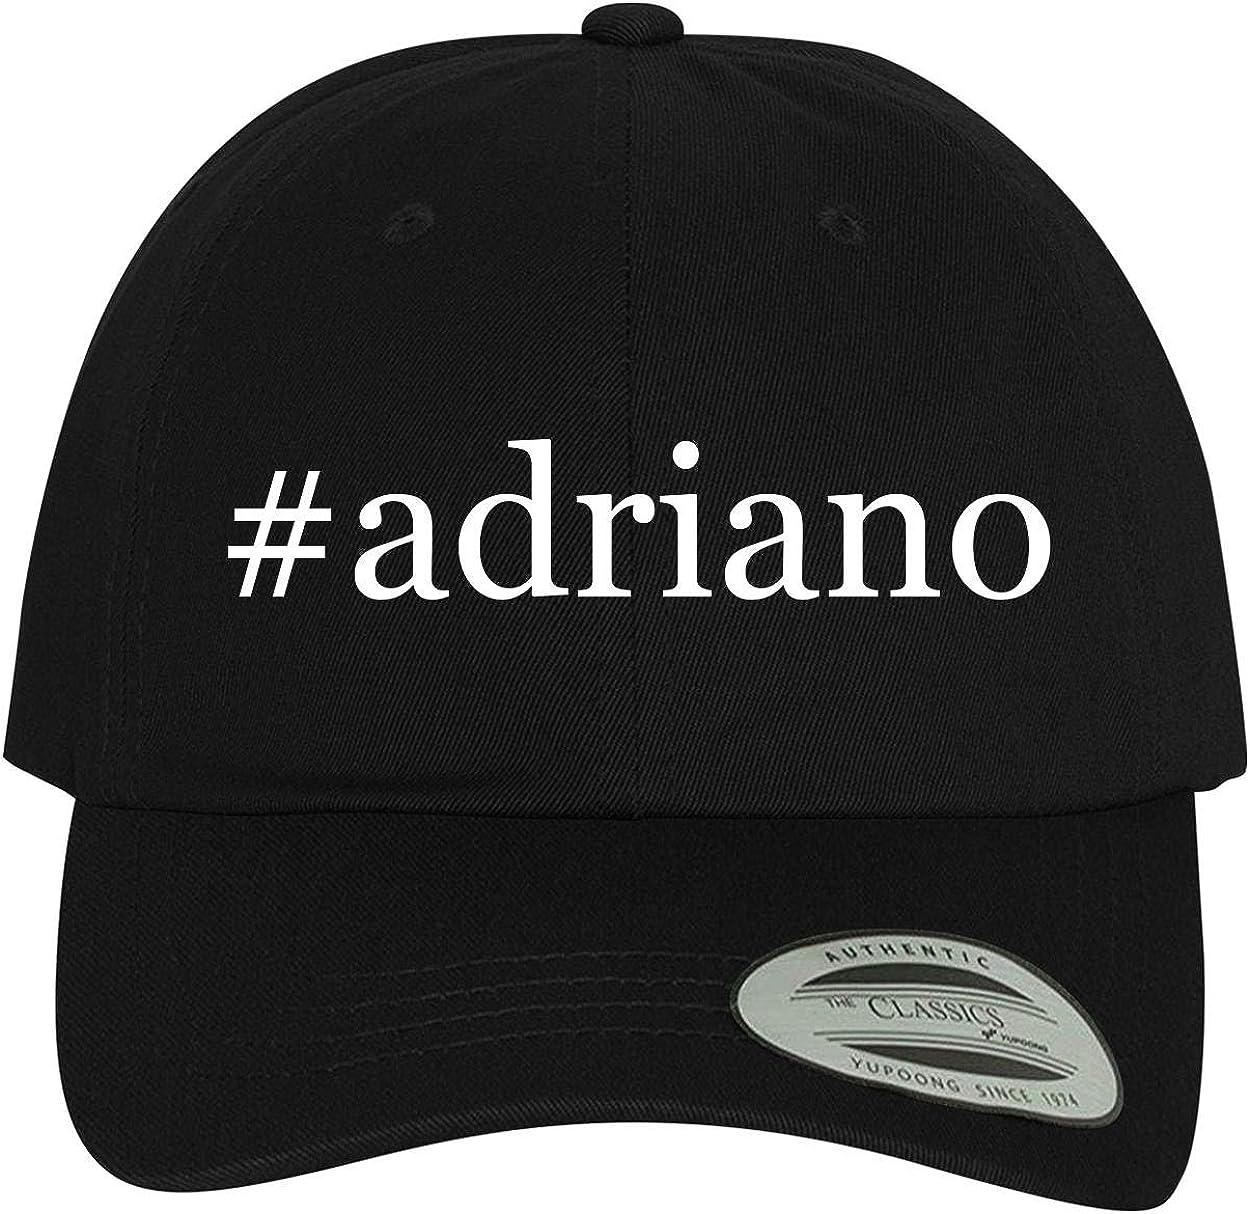 Comfortable Dad Hat Baseball Cap BH Cool Designs #Adriano